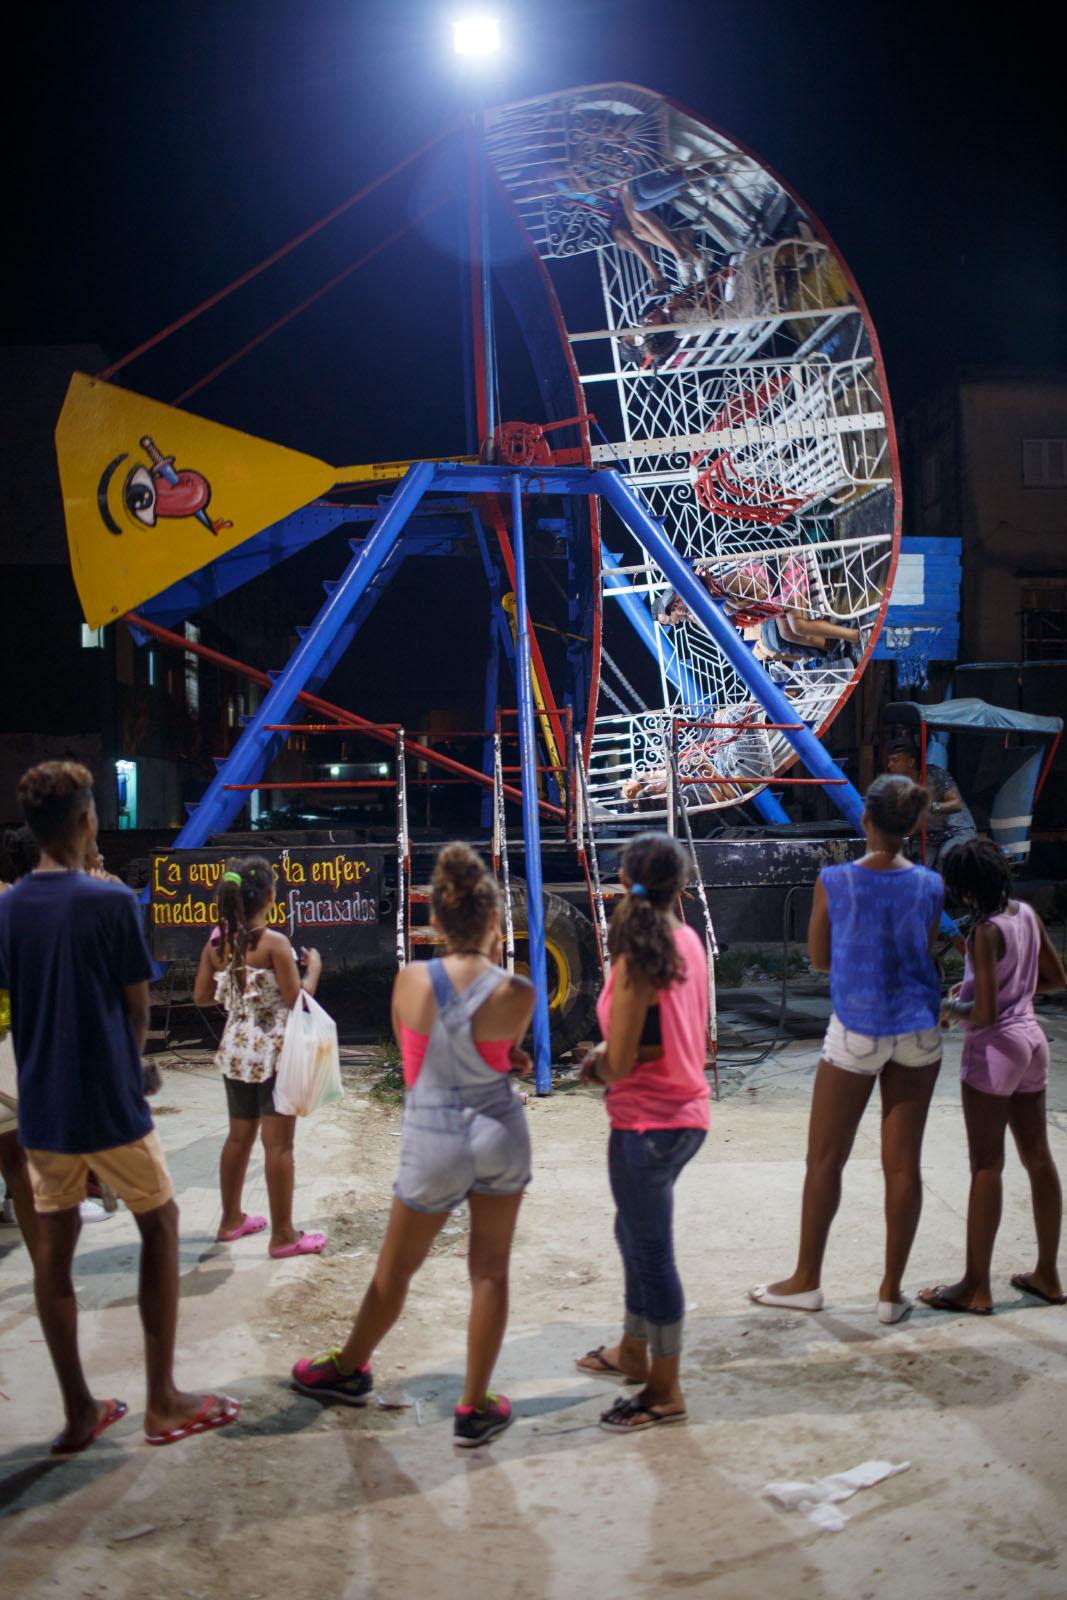 Havana park off track betting alberto cogliati gabetting